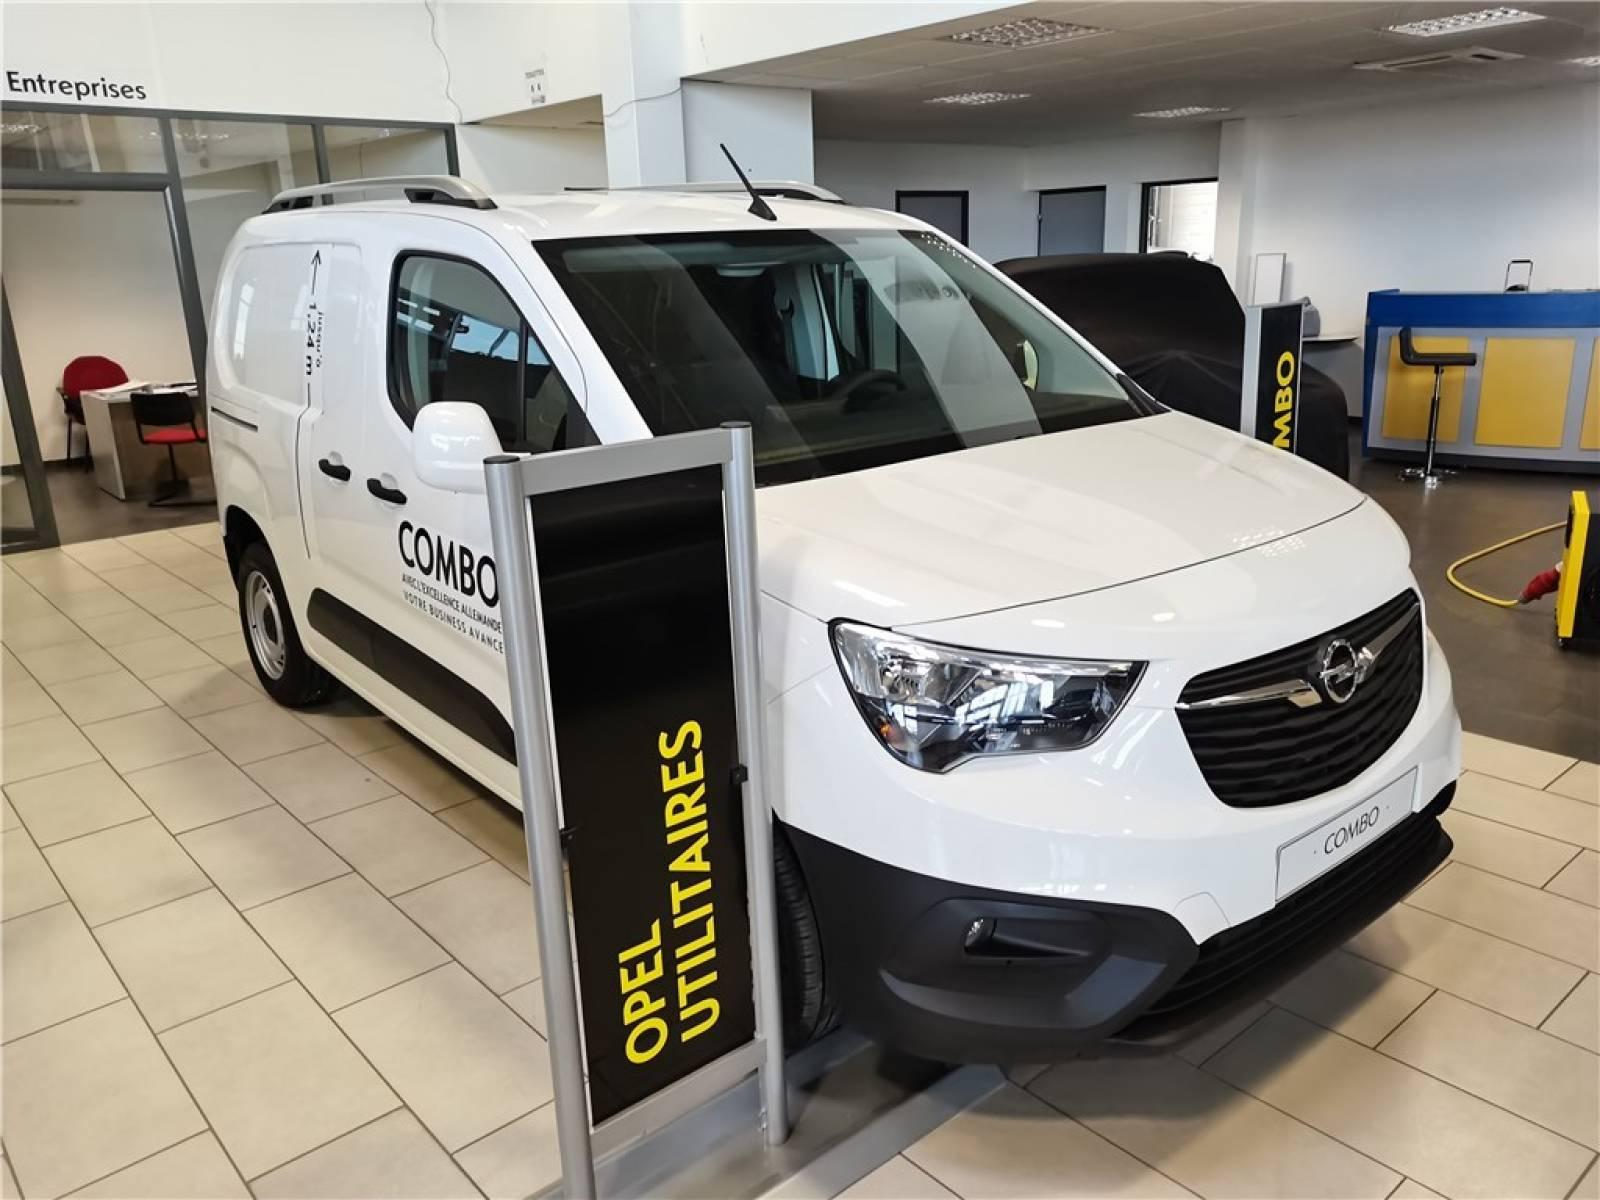 OPEL COMBO CARGO 1.5 100 CH L1H1 STANDARD - véhicule d'occasion - Groupe Guillet - Opel Magicauto - Chalon-sur-Saône - 71380 - Saint-Marcel - 19